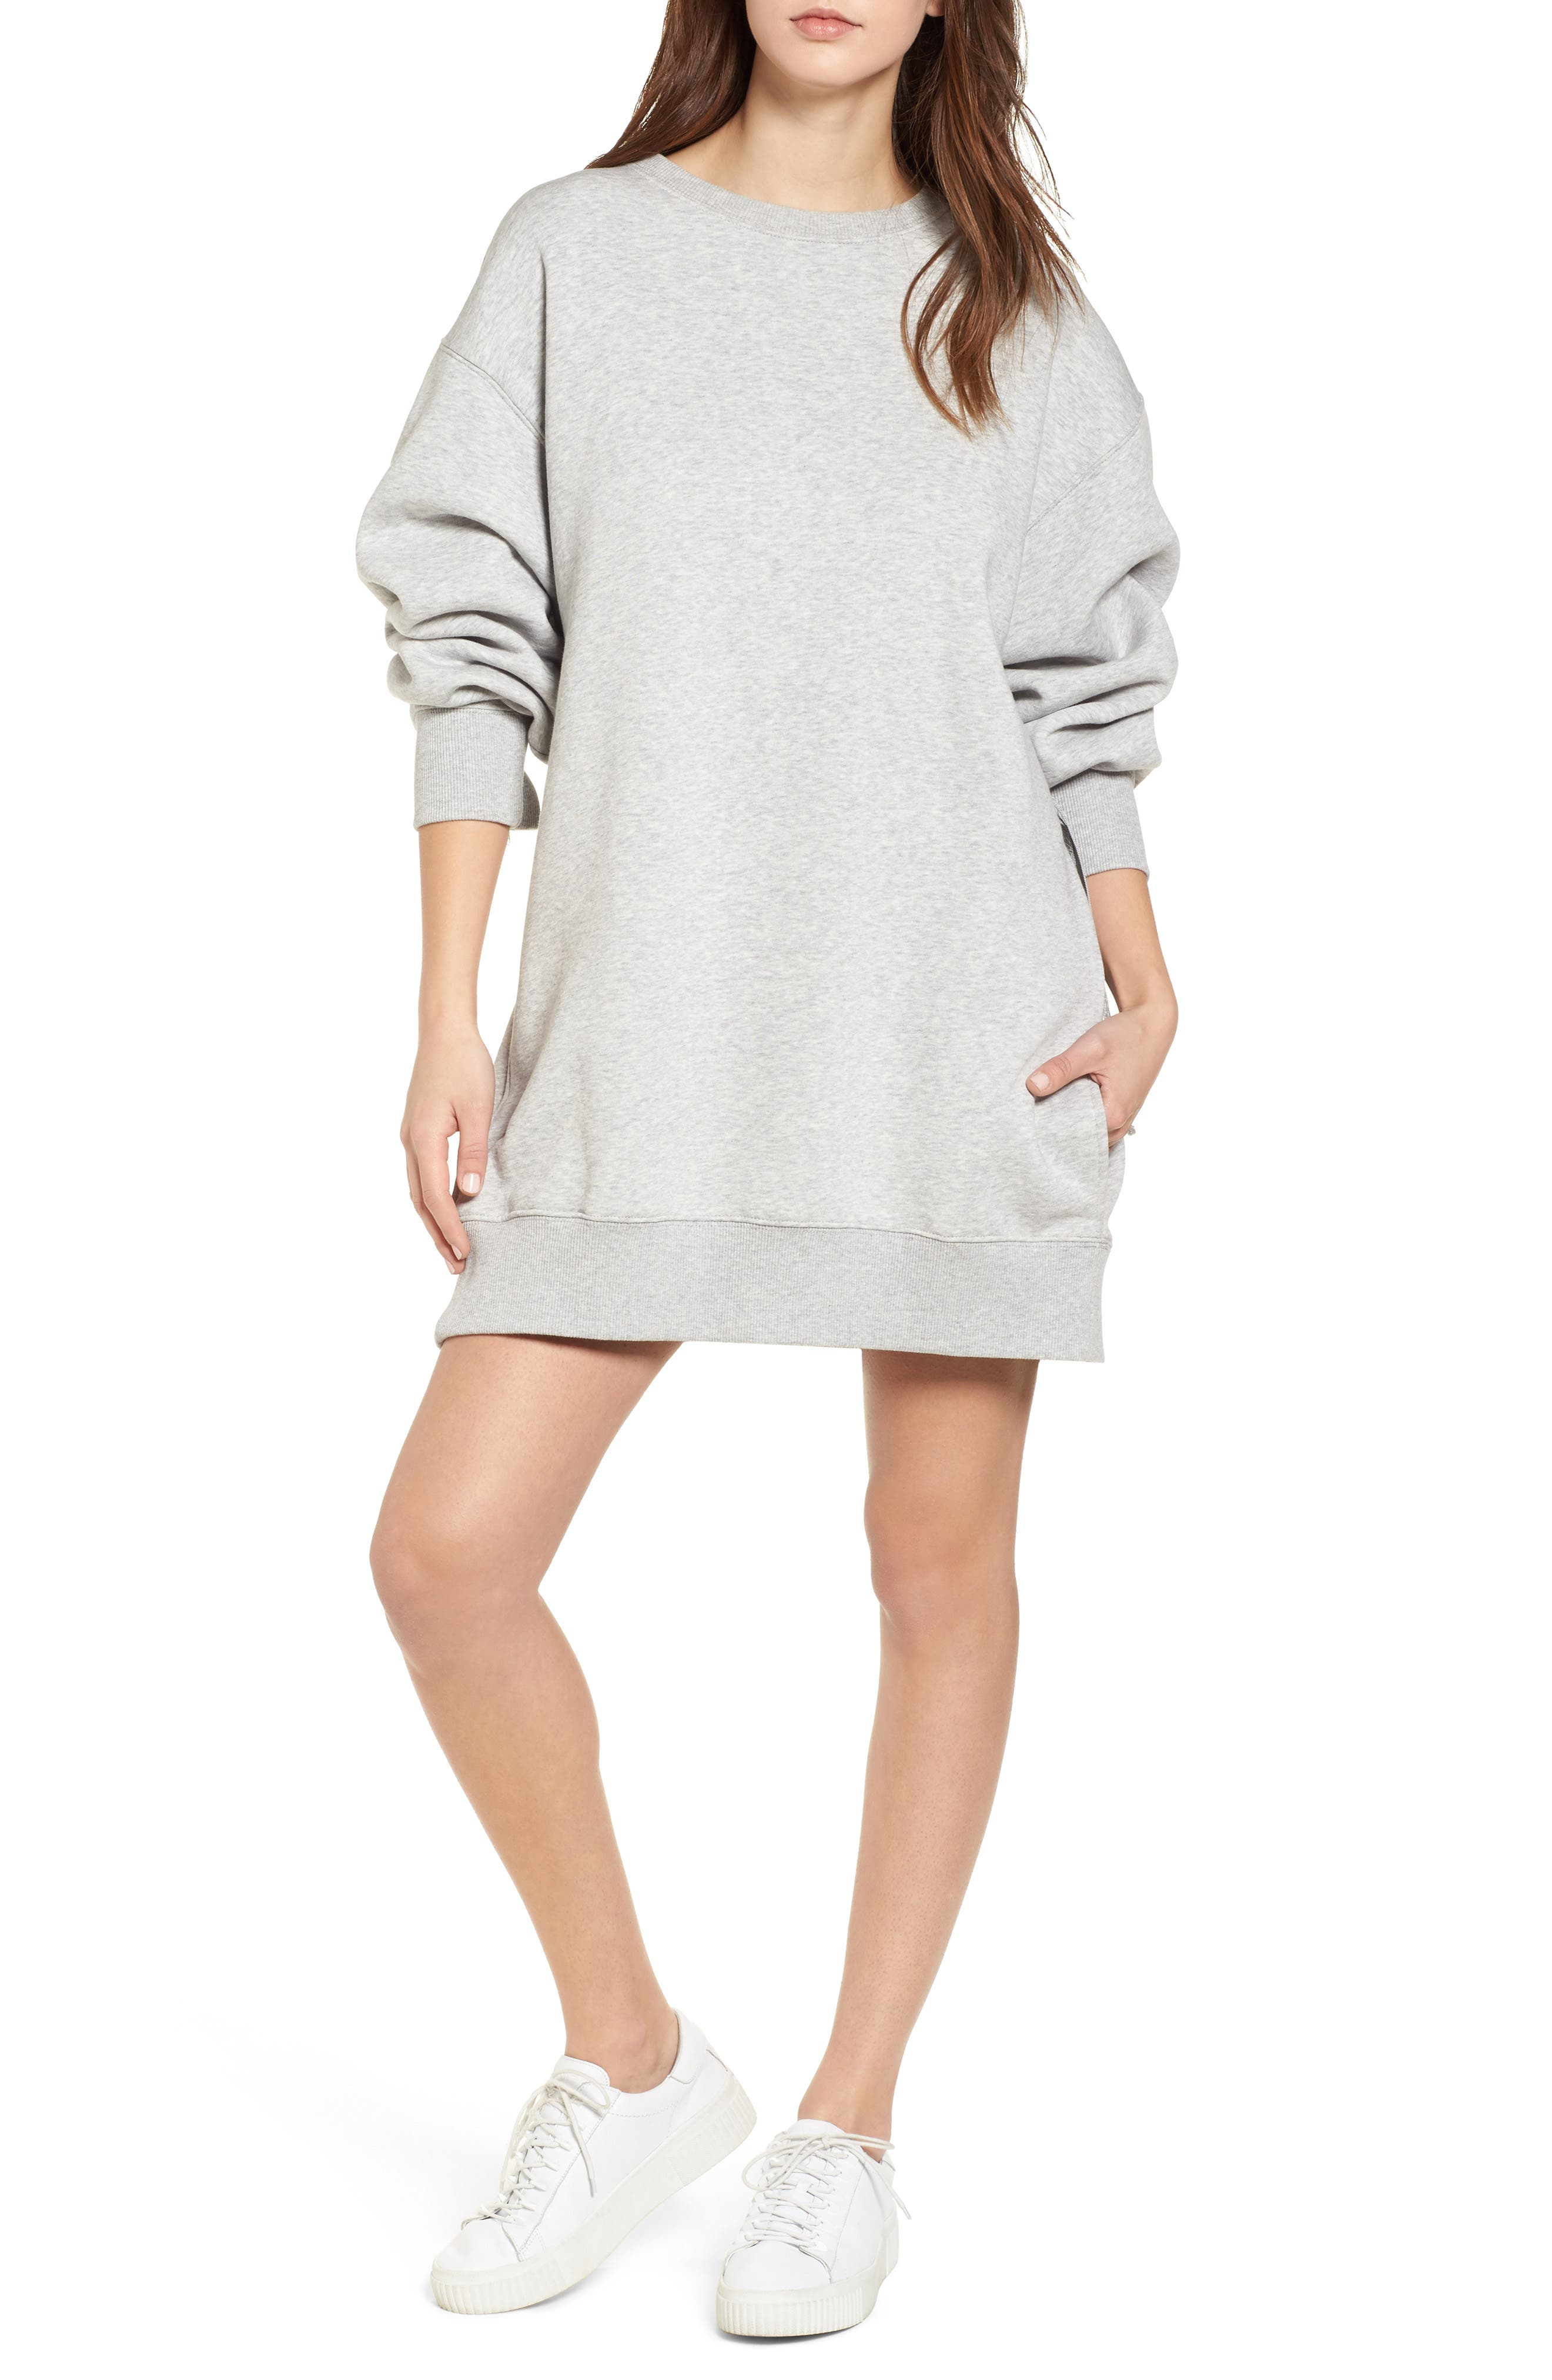 x Gigi Hadid Sweatshirt Dress,                             Main thumbnail 1, color,                             020